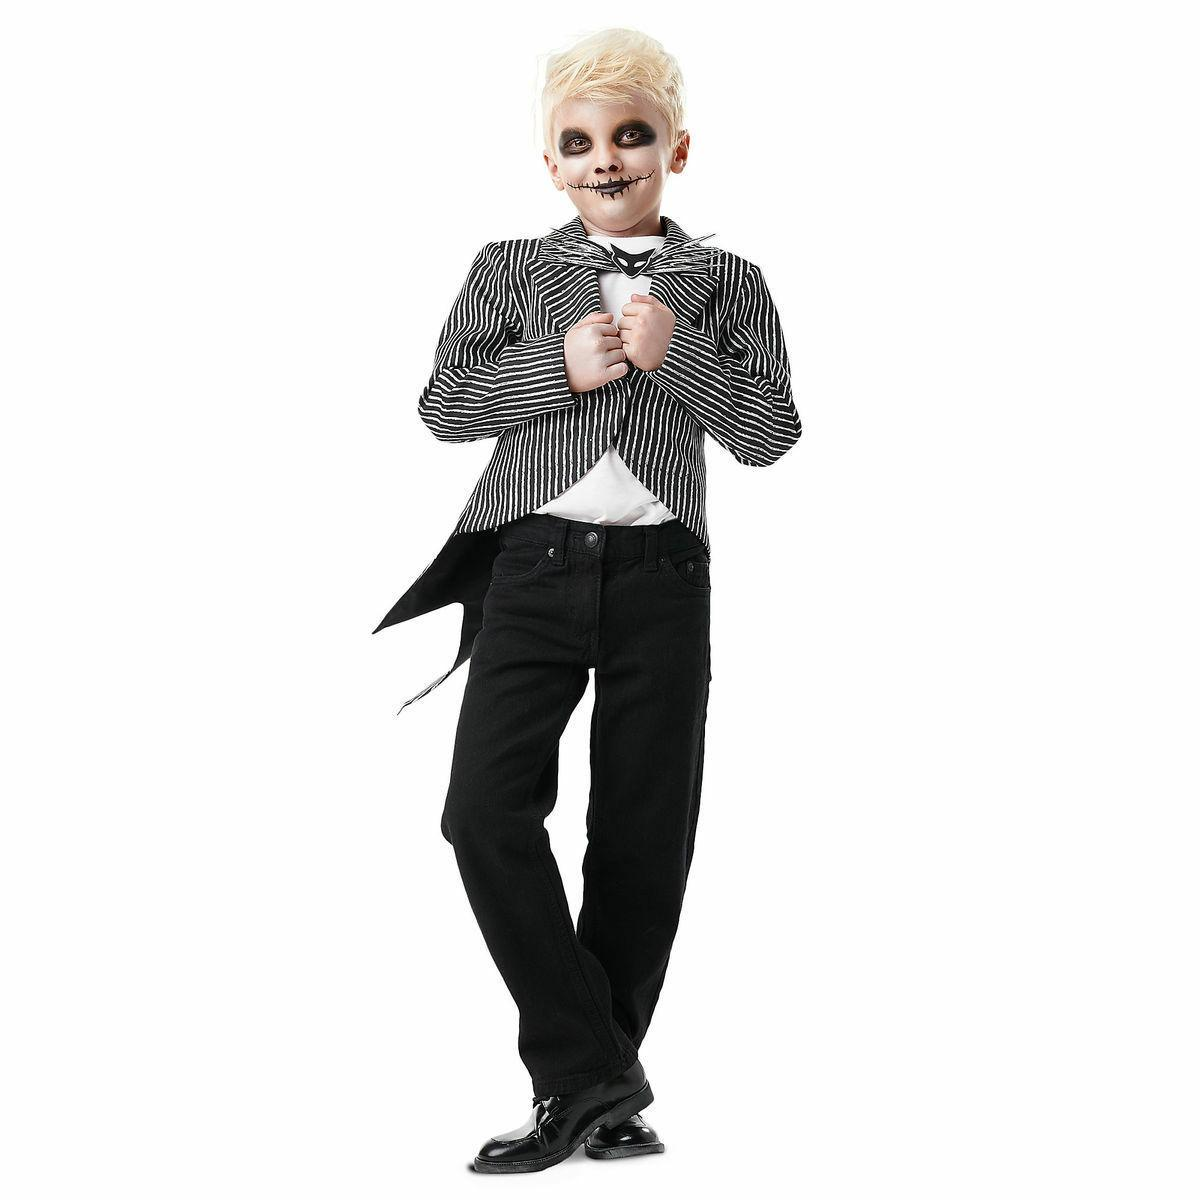 new Jack Costume Jacket for Kids 5/6